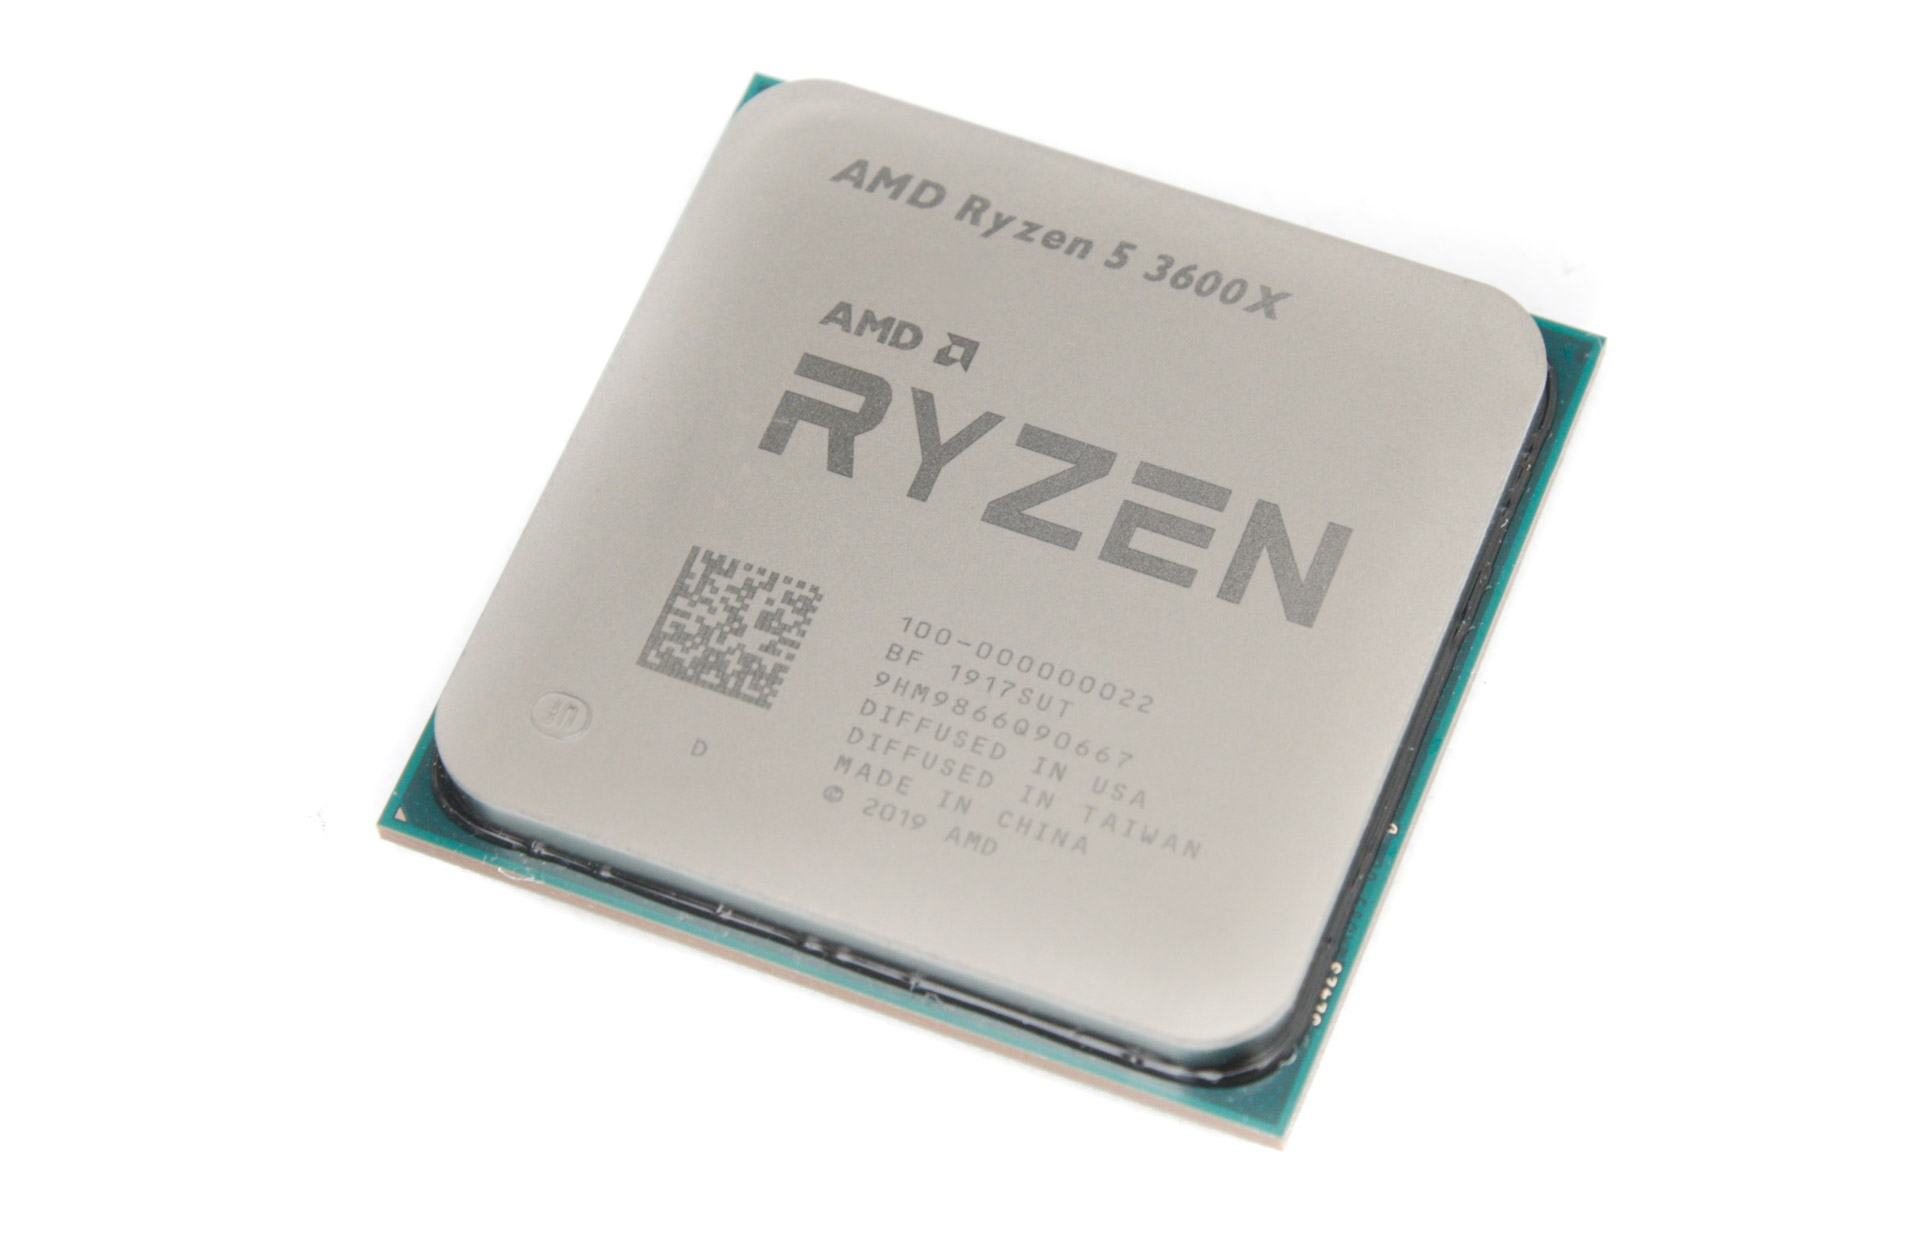 Amd Ryzen 5 3600x Review Bit Tech Net